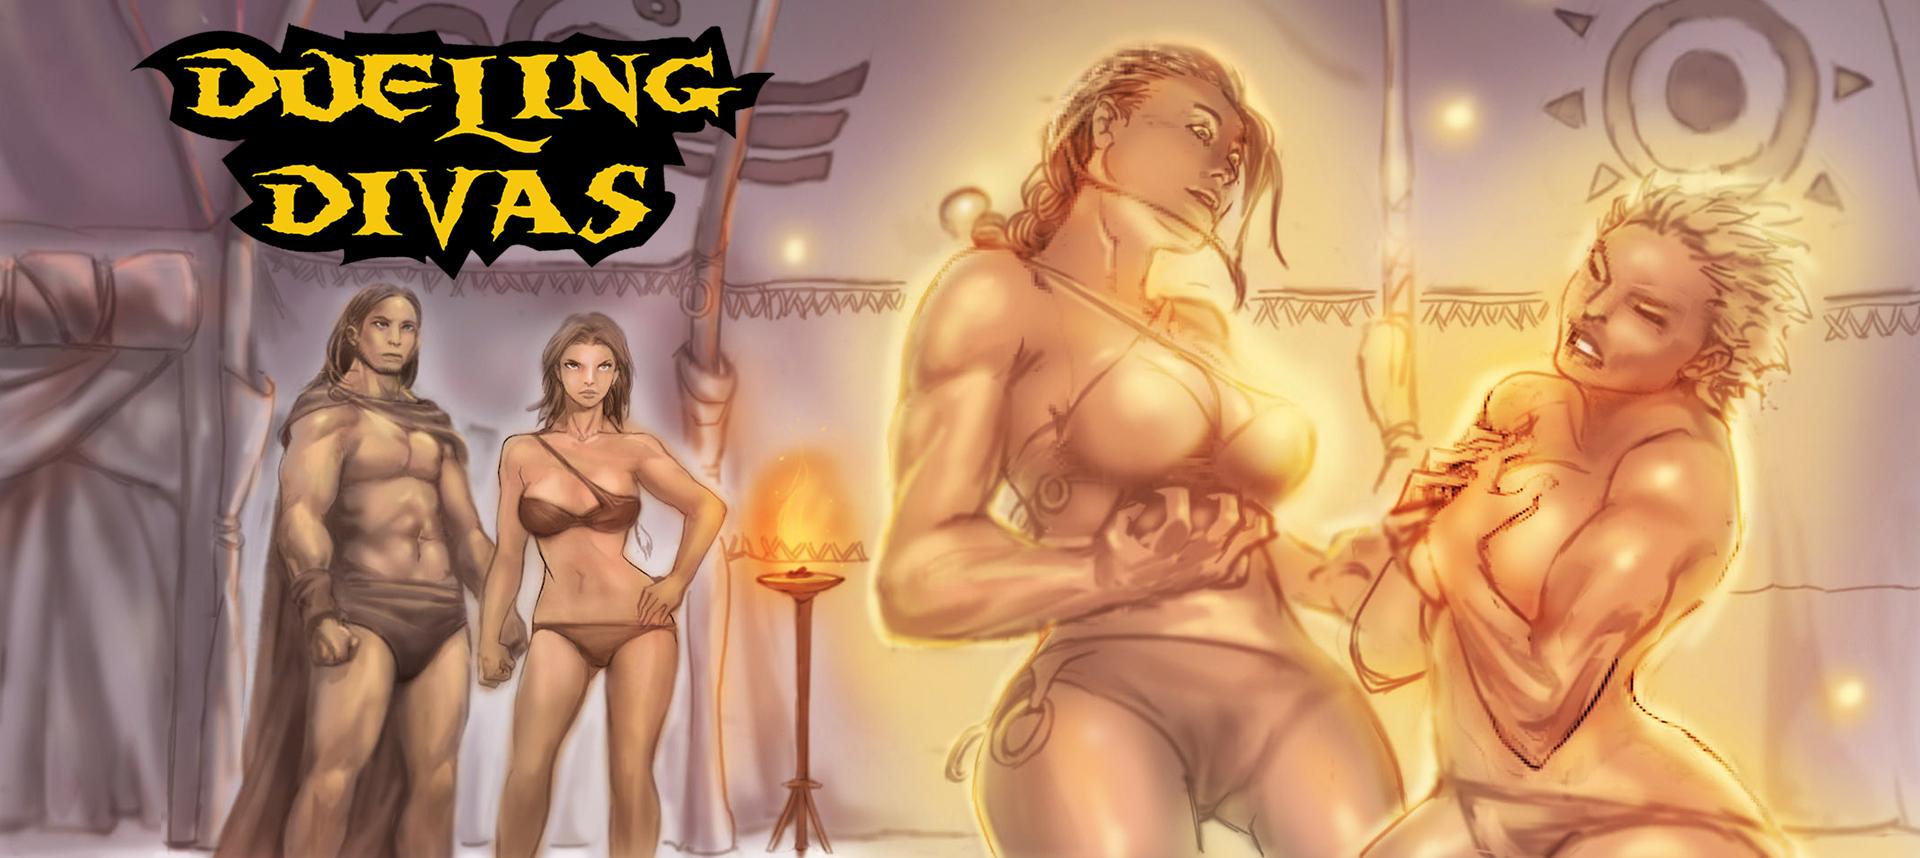 Dueling-Divas_01-SLIDE